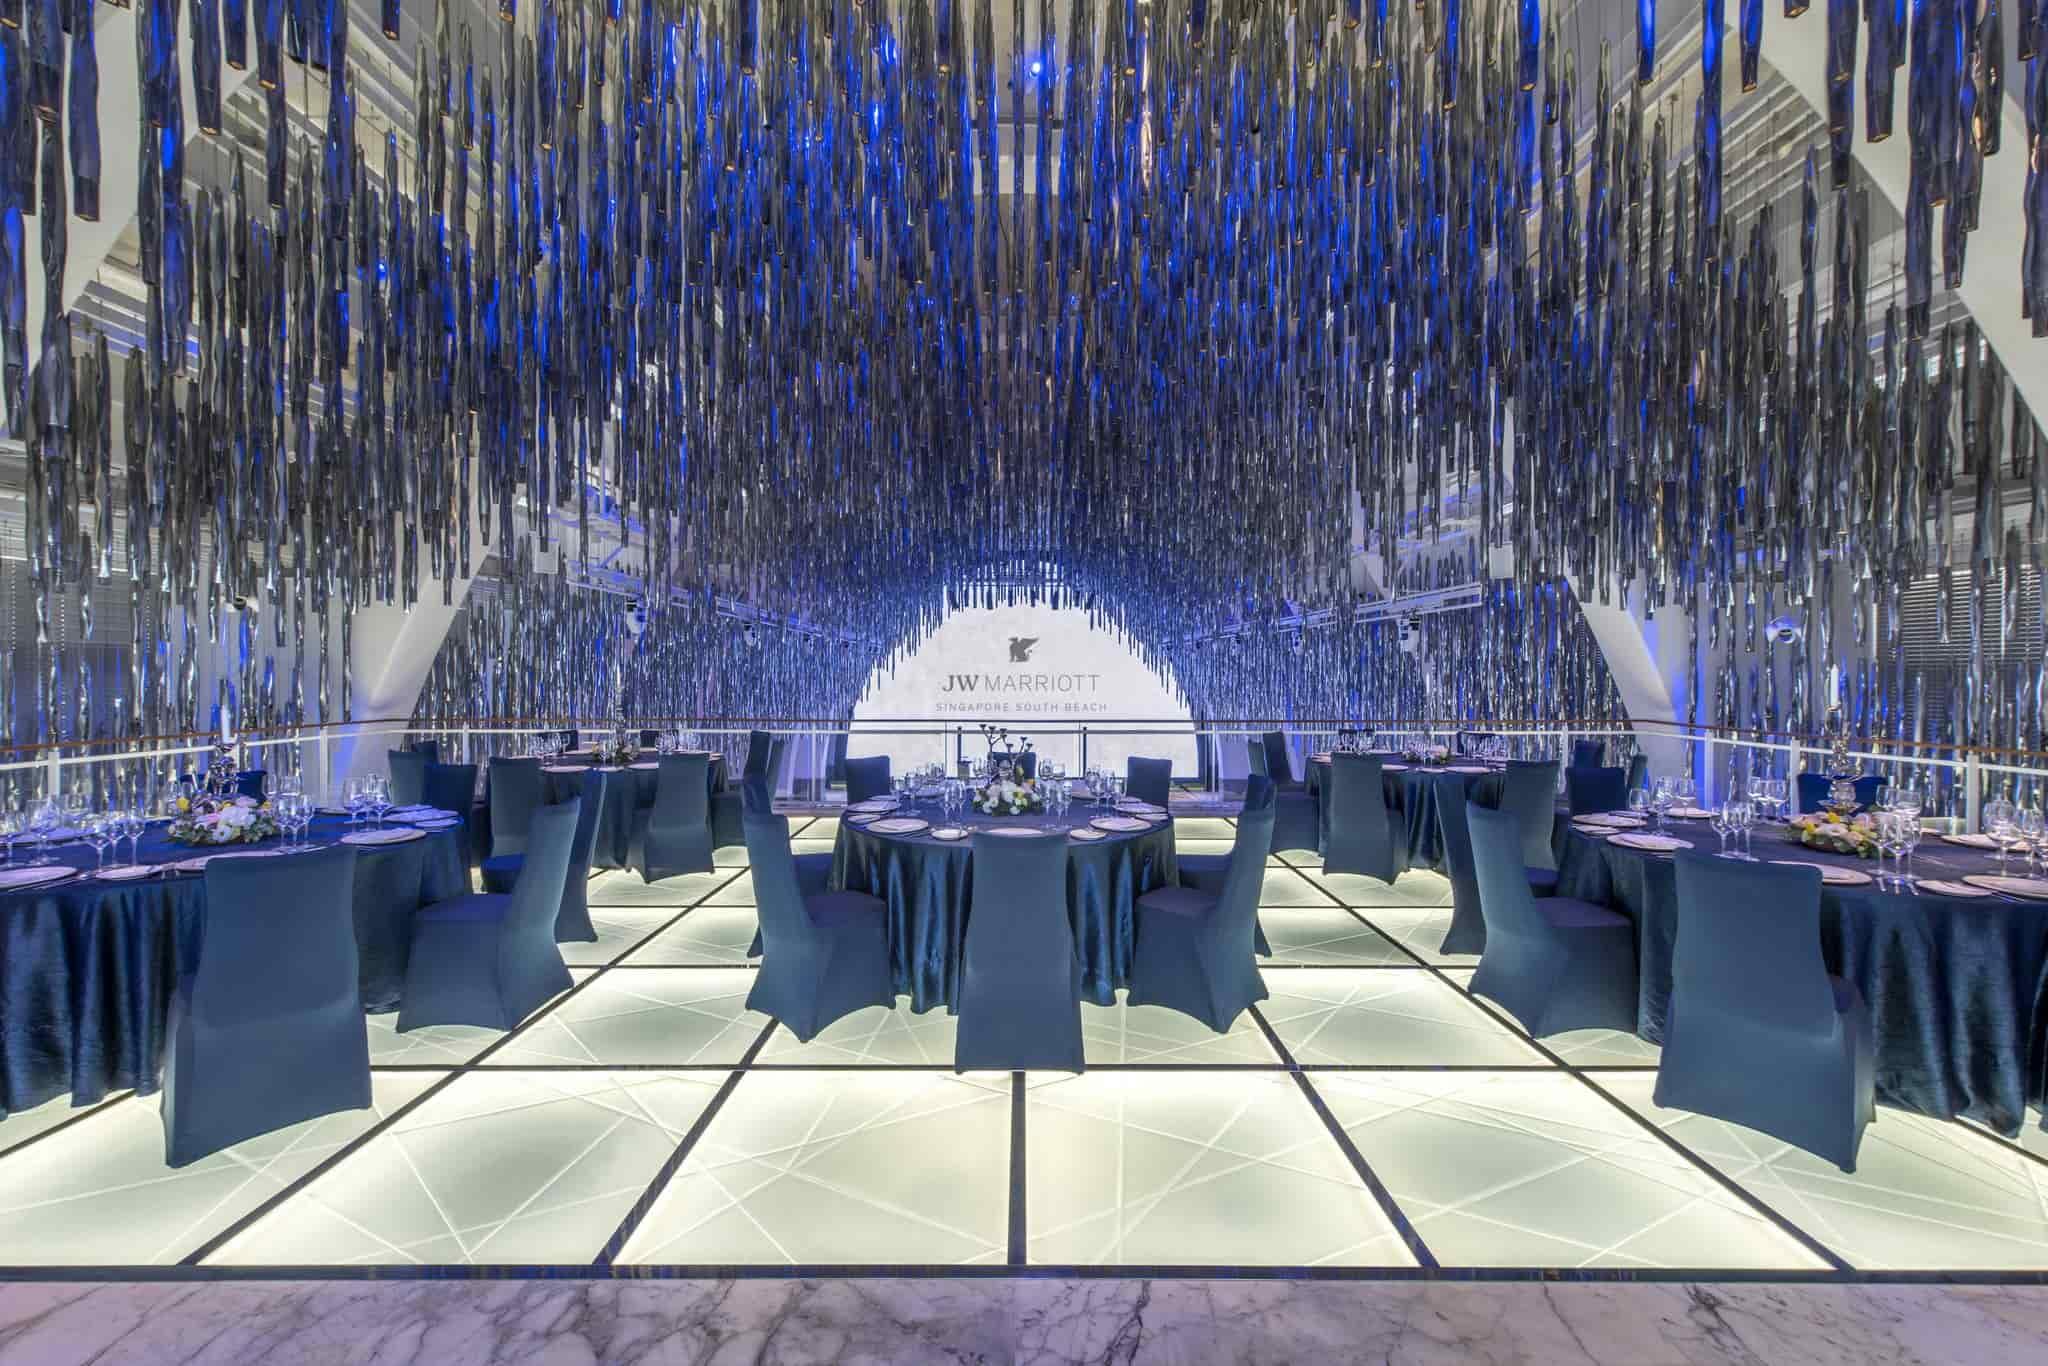 Singapore Design Guide singapore design guide Singapore Design Guide sinjw ballroom 0040 hor clsc S min